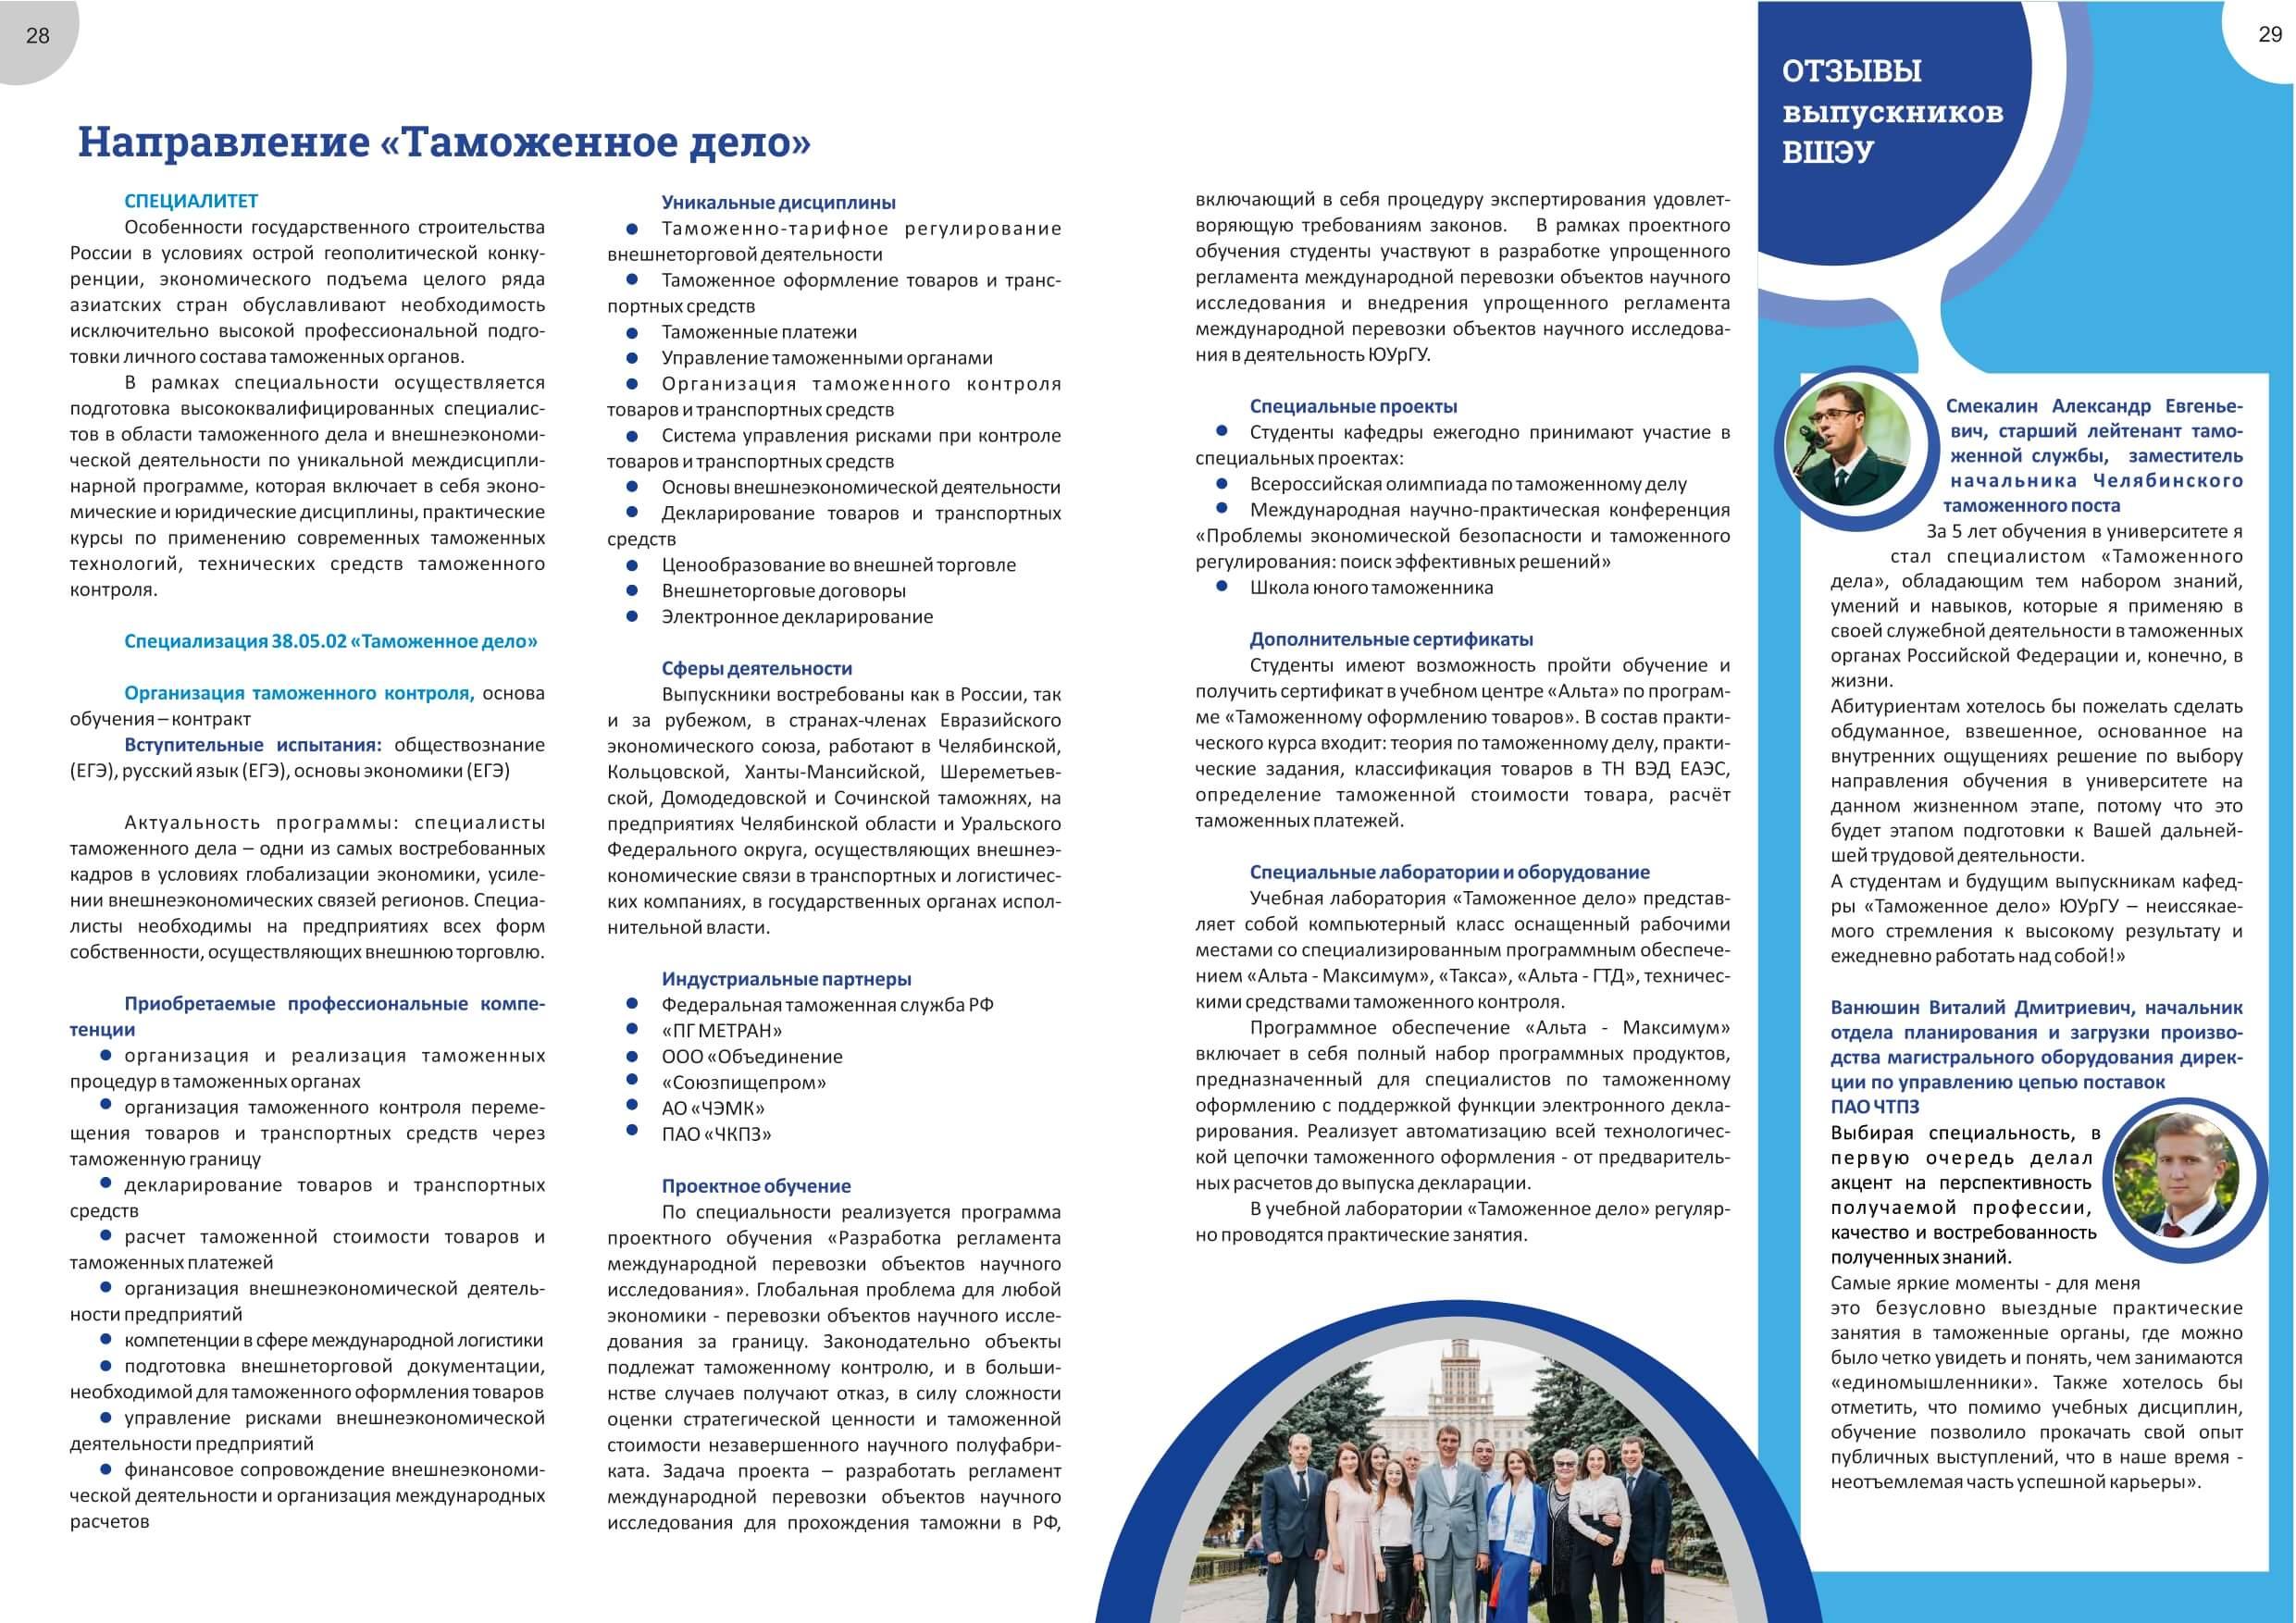 ВШЭУ Прием абитуриентов 2021_pages-to-jpg-0015